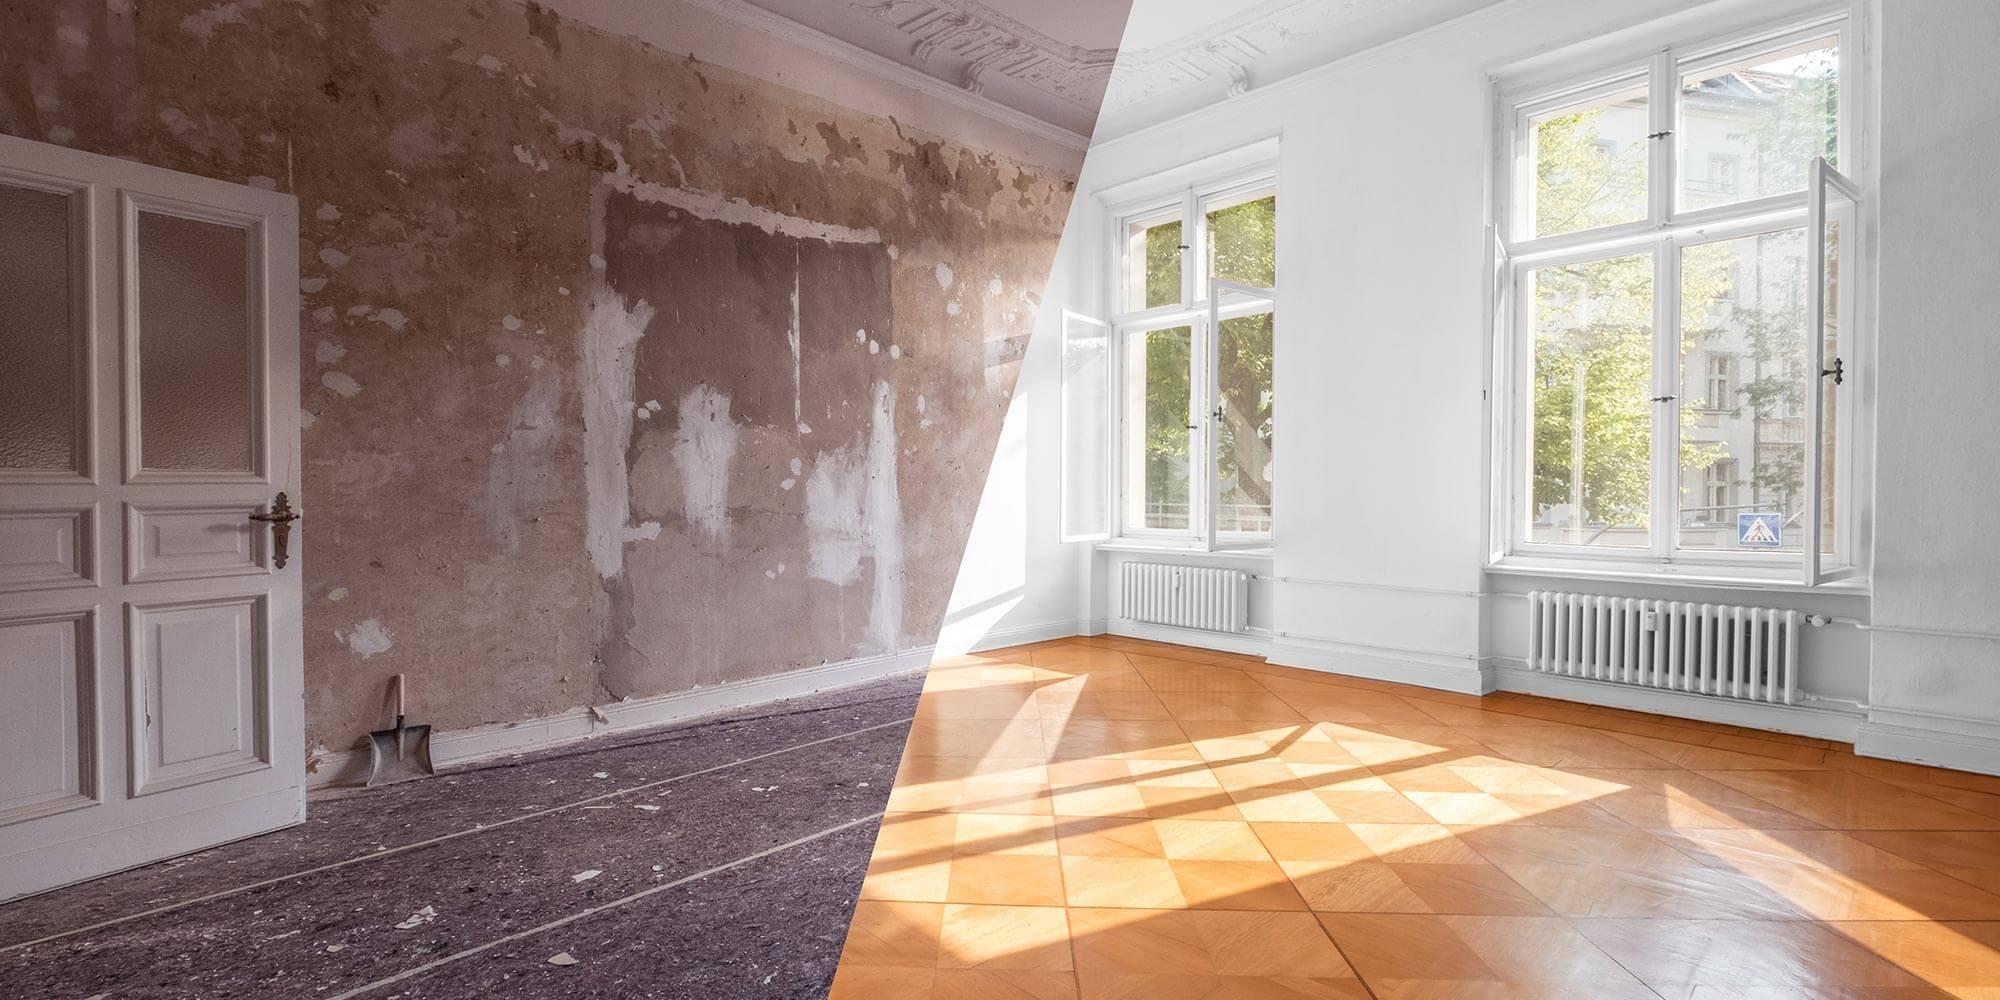 Gewerbeimmobilien - Redevelopment